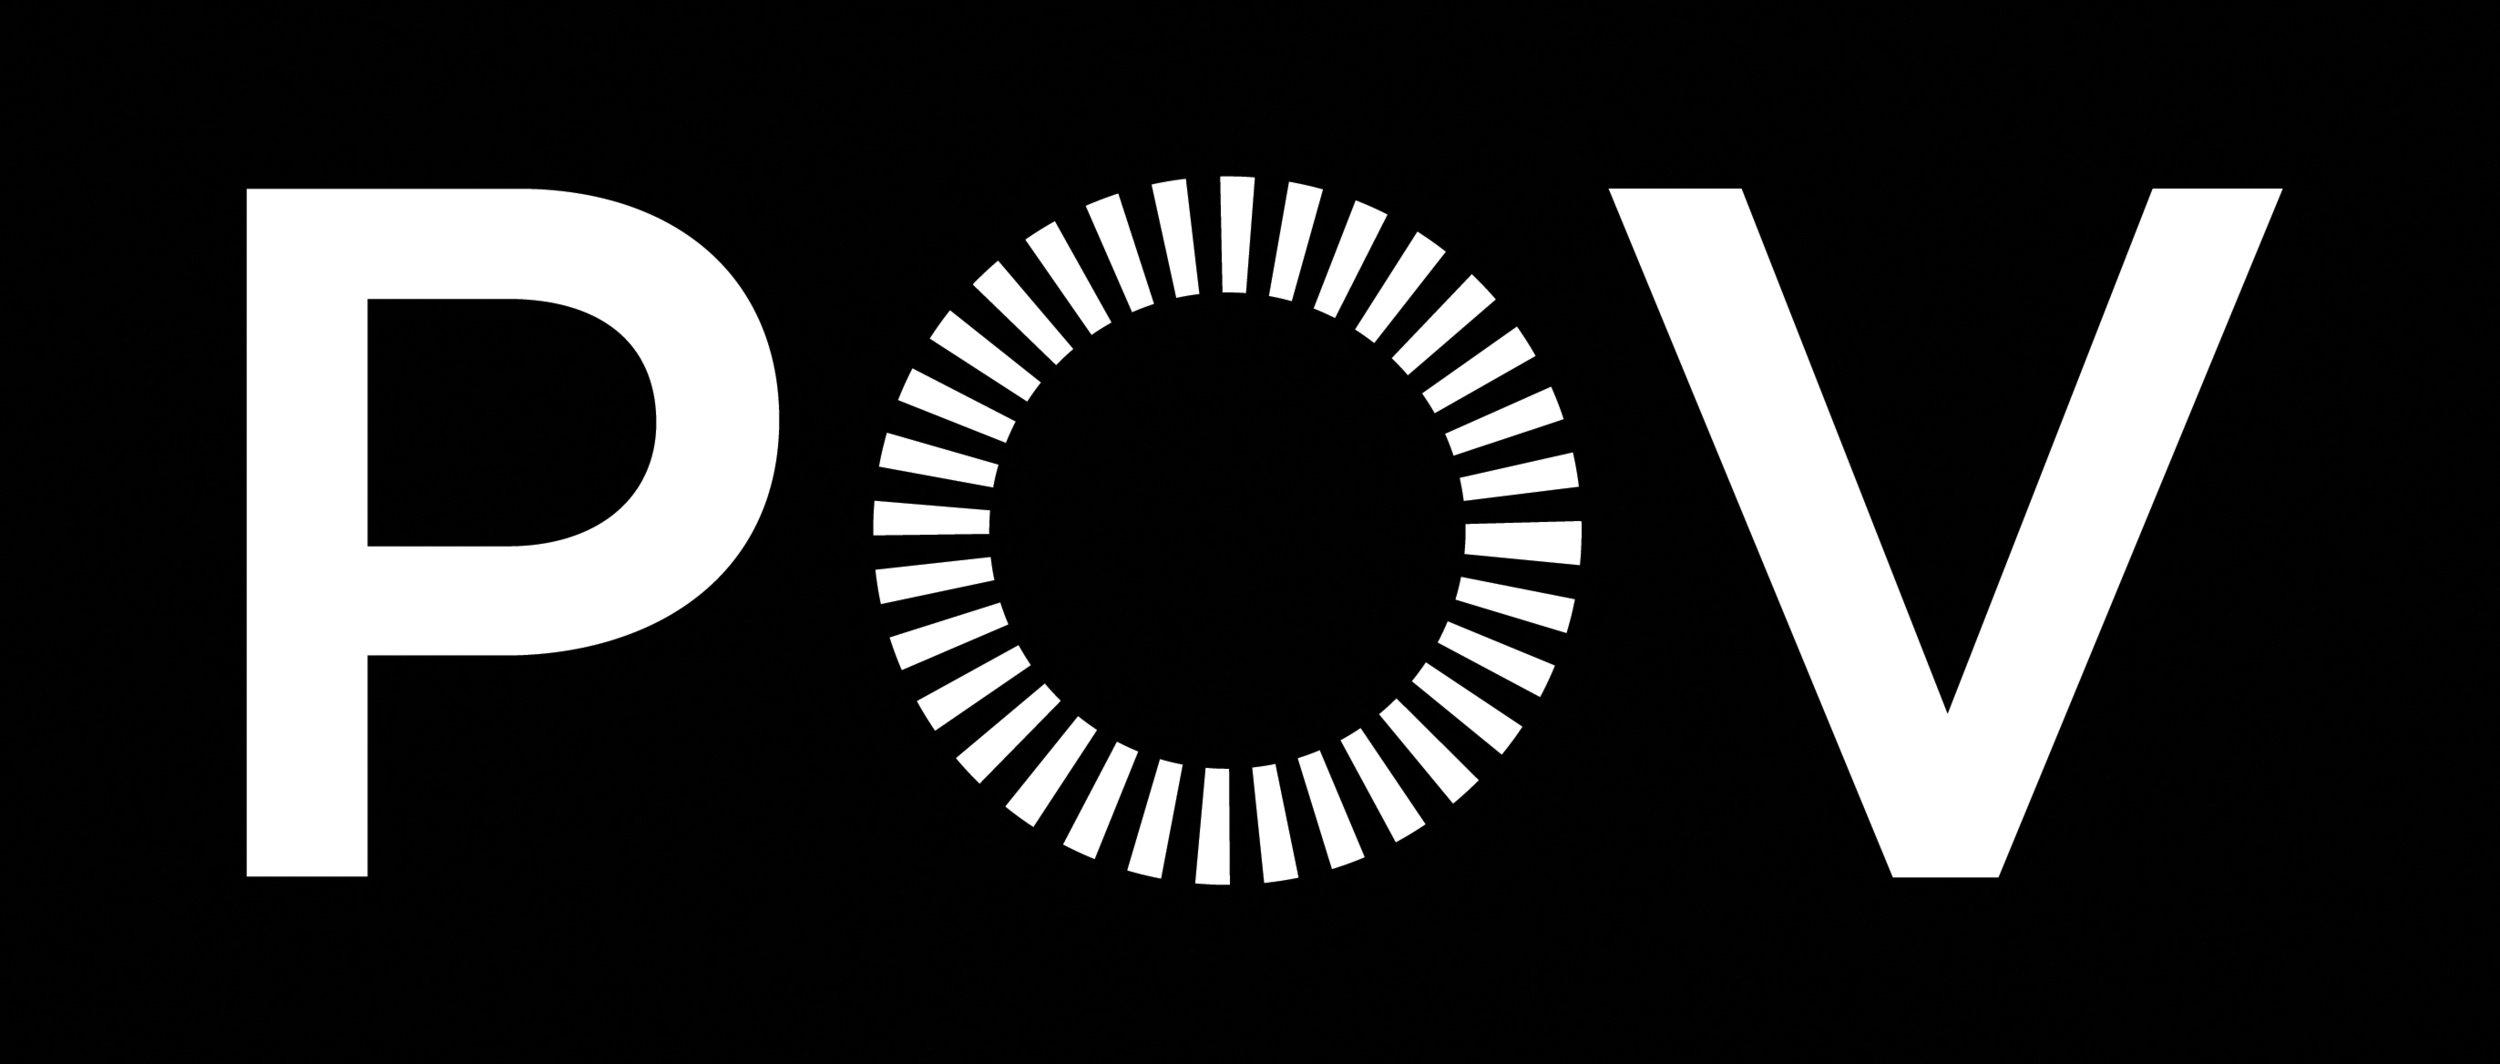 pov-logo-black-bg-white-text-2744x1168.jpg